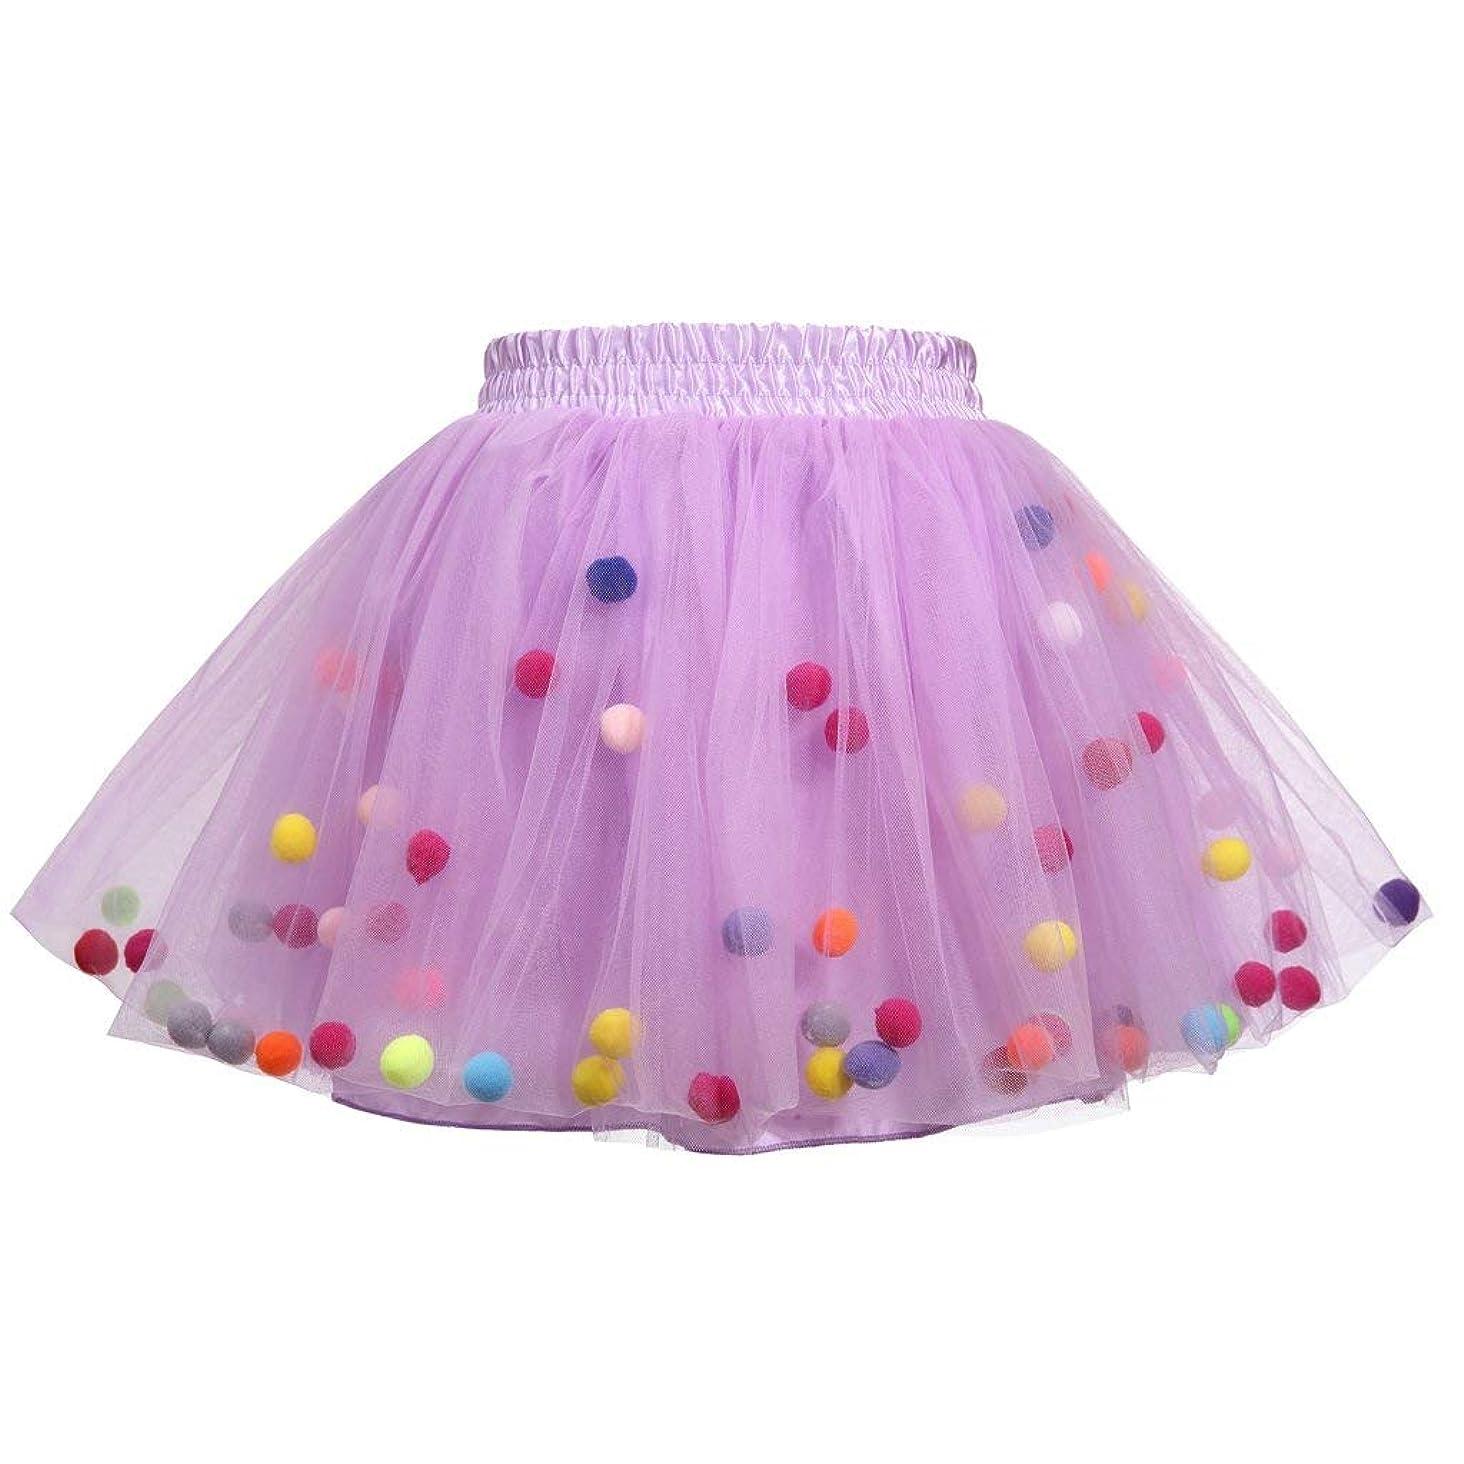 Meeyou Little Girls' 3 Layers Tutu Skirt with 3D Pom Pom Puff Balls